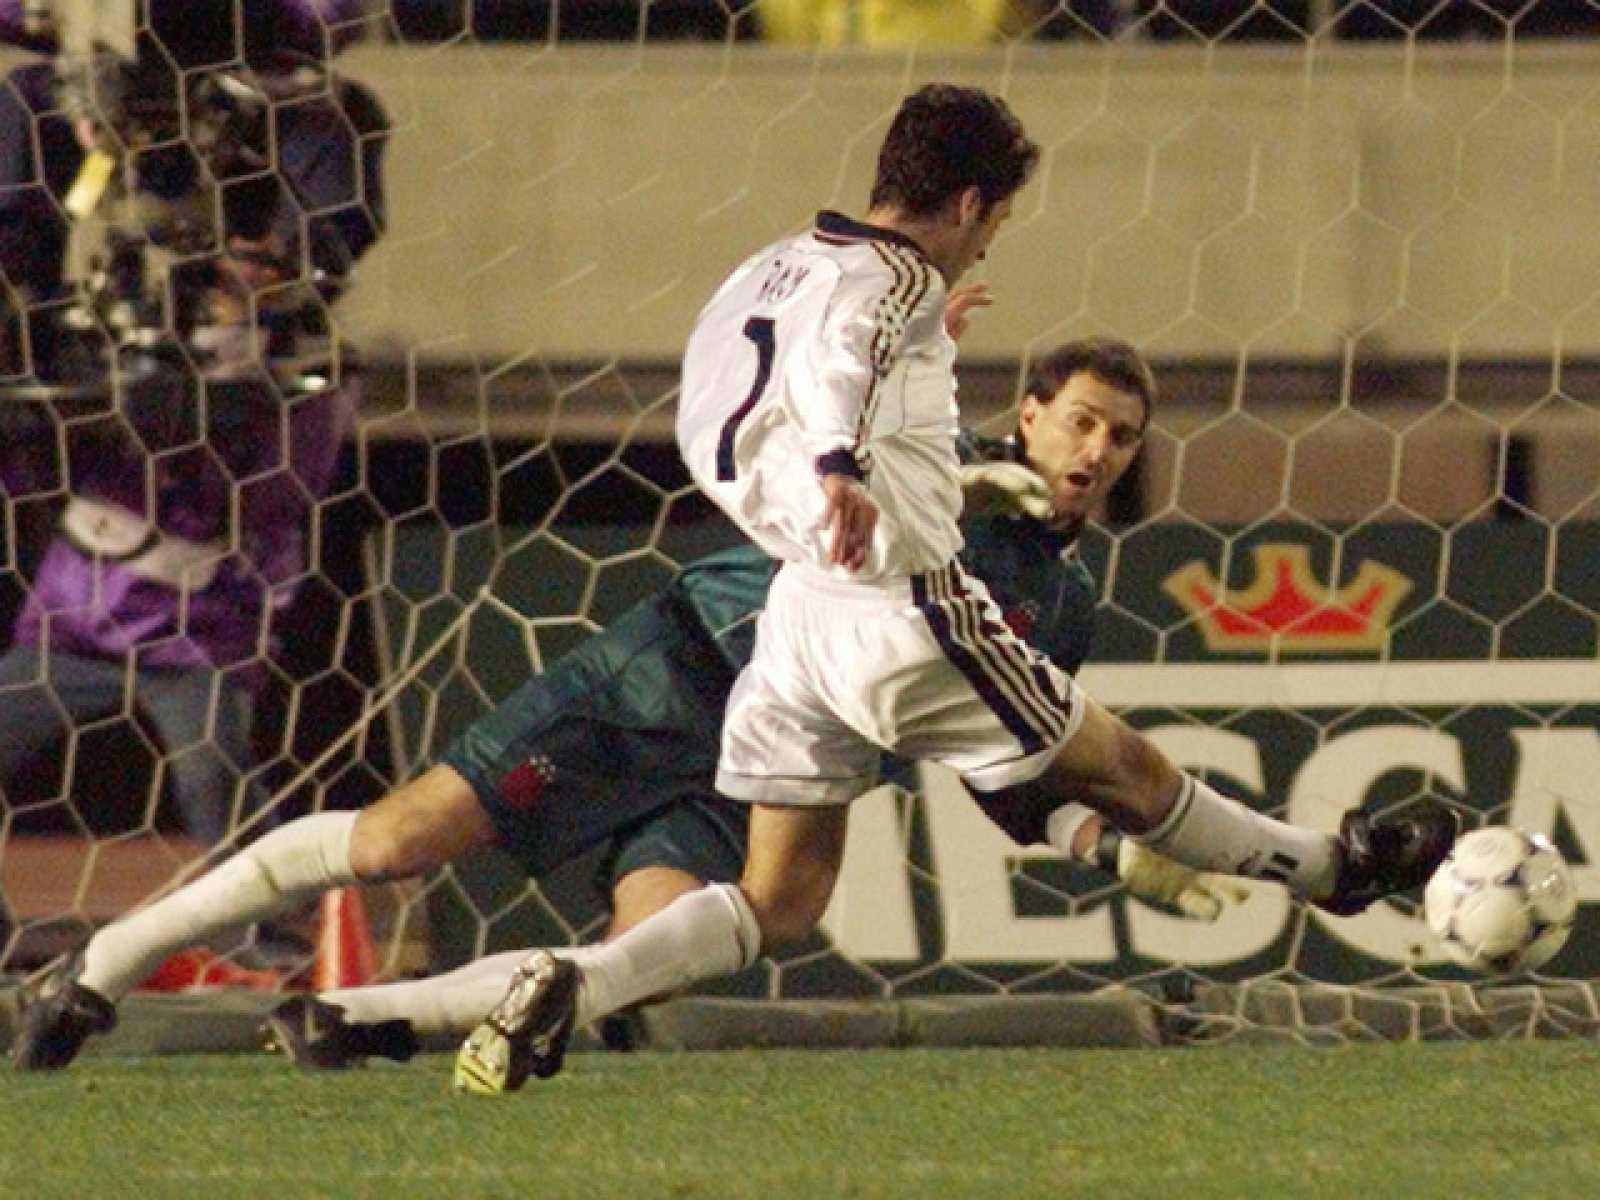 Declaraciones del jugador del Real Madrid, Raúl, sobre el gol que marcó en la final del campeonato de clubs en 1998.